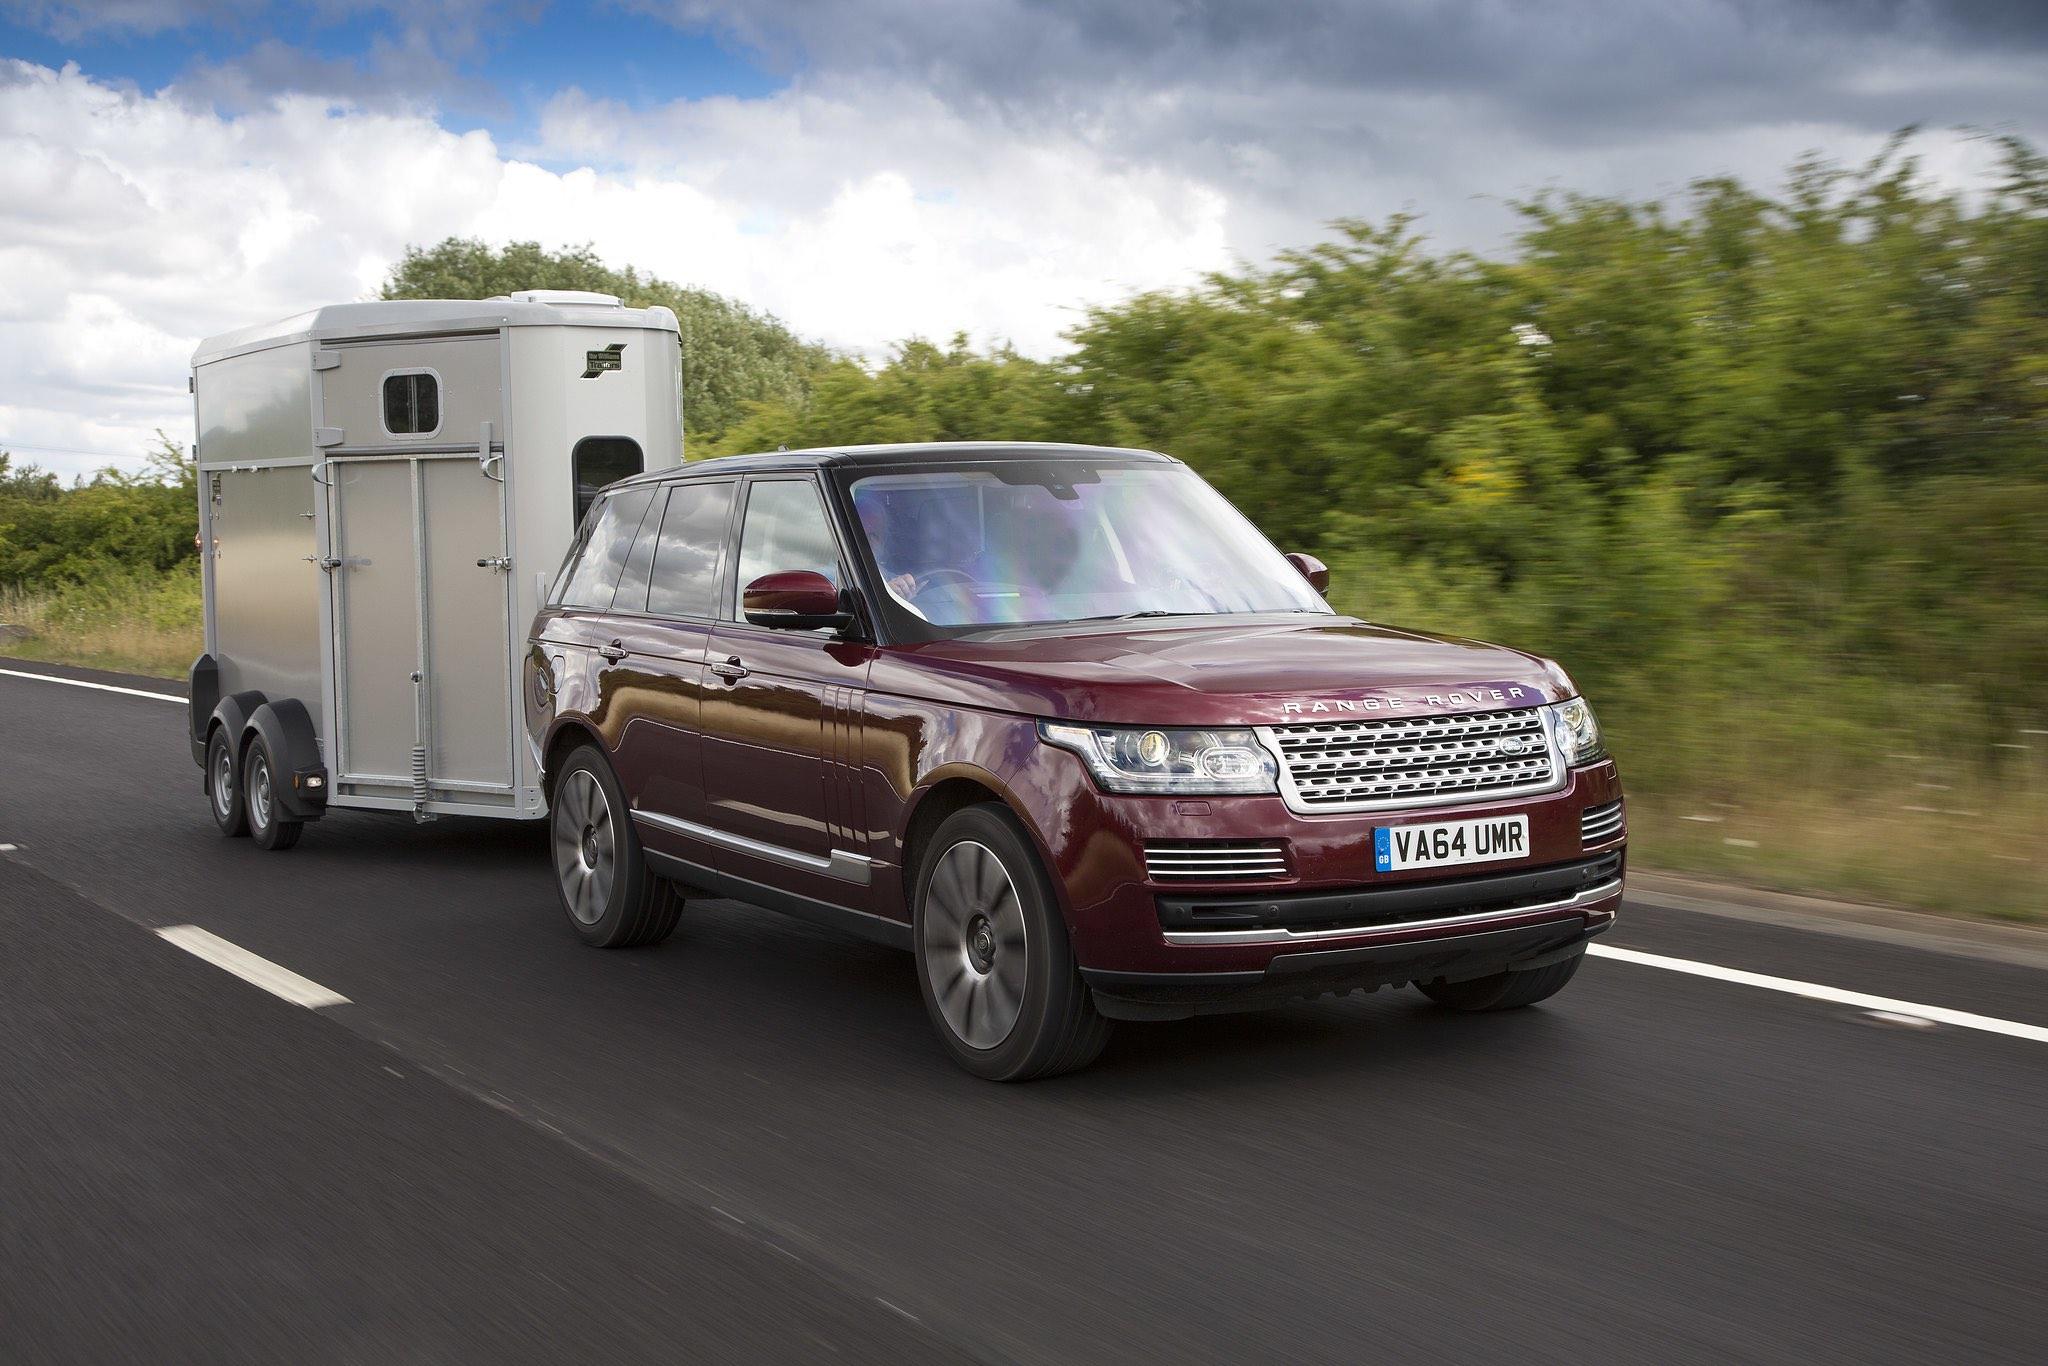 Utility Trailer Range Rover